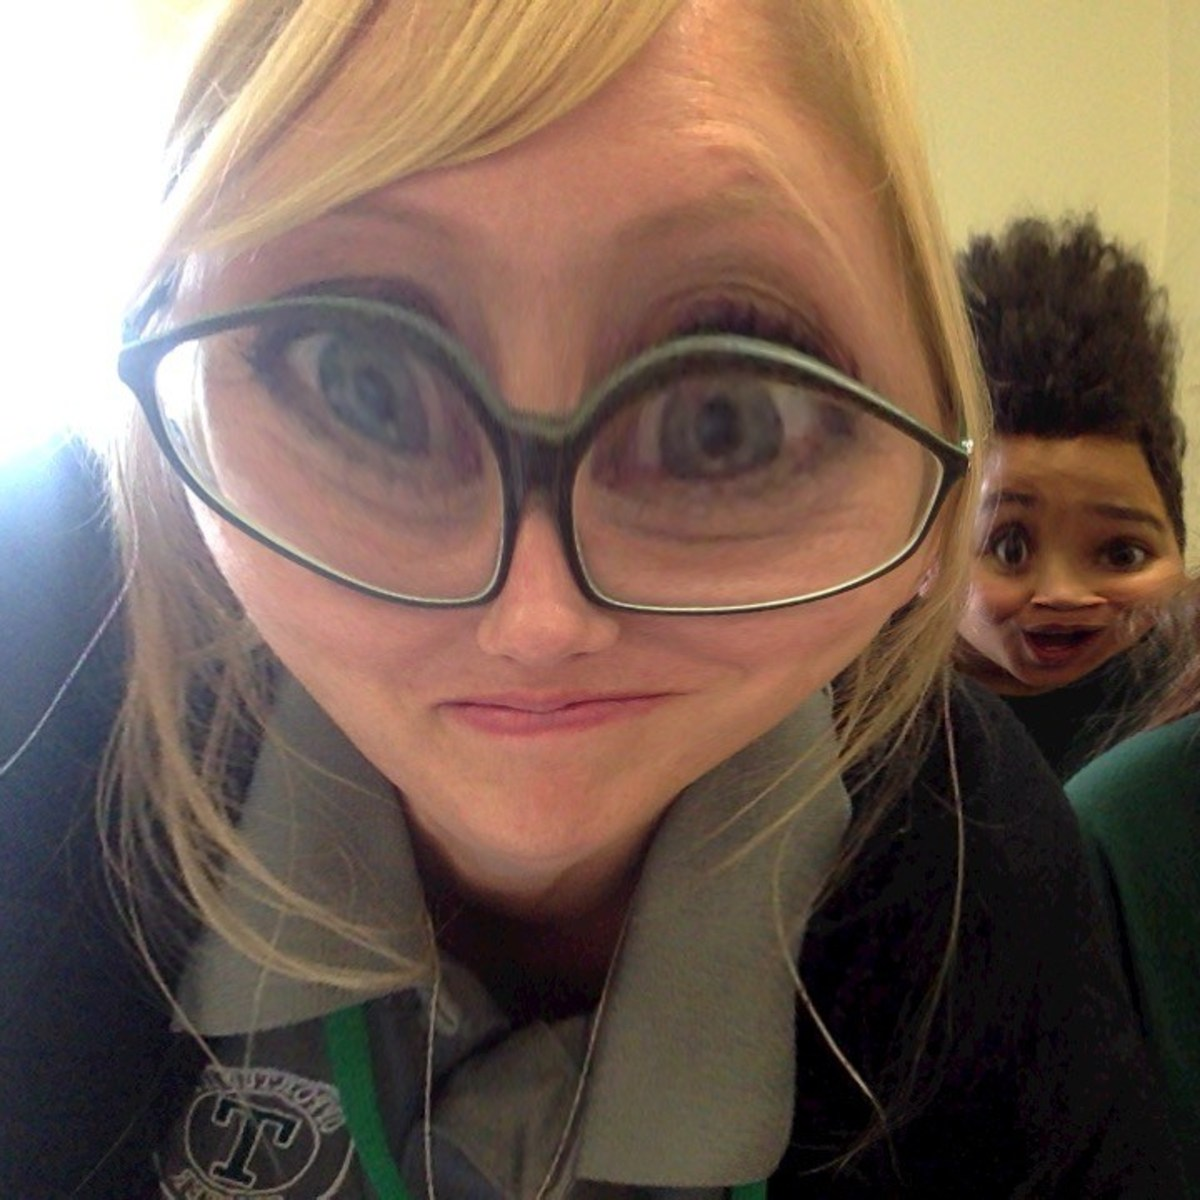 Selfie Erika Wheaton nude (12 photo), Sexy, Leaked, Selfie, legs 2015